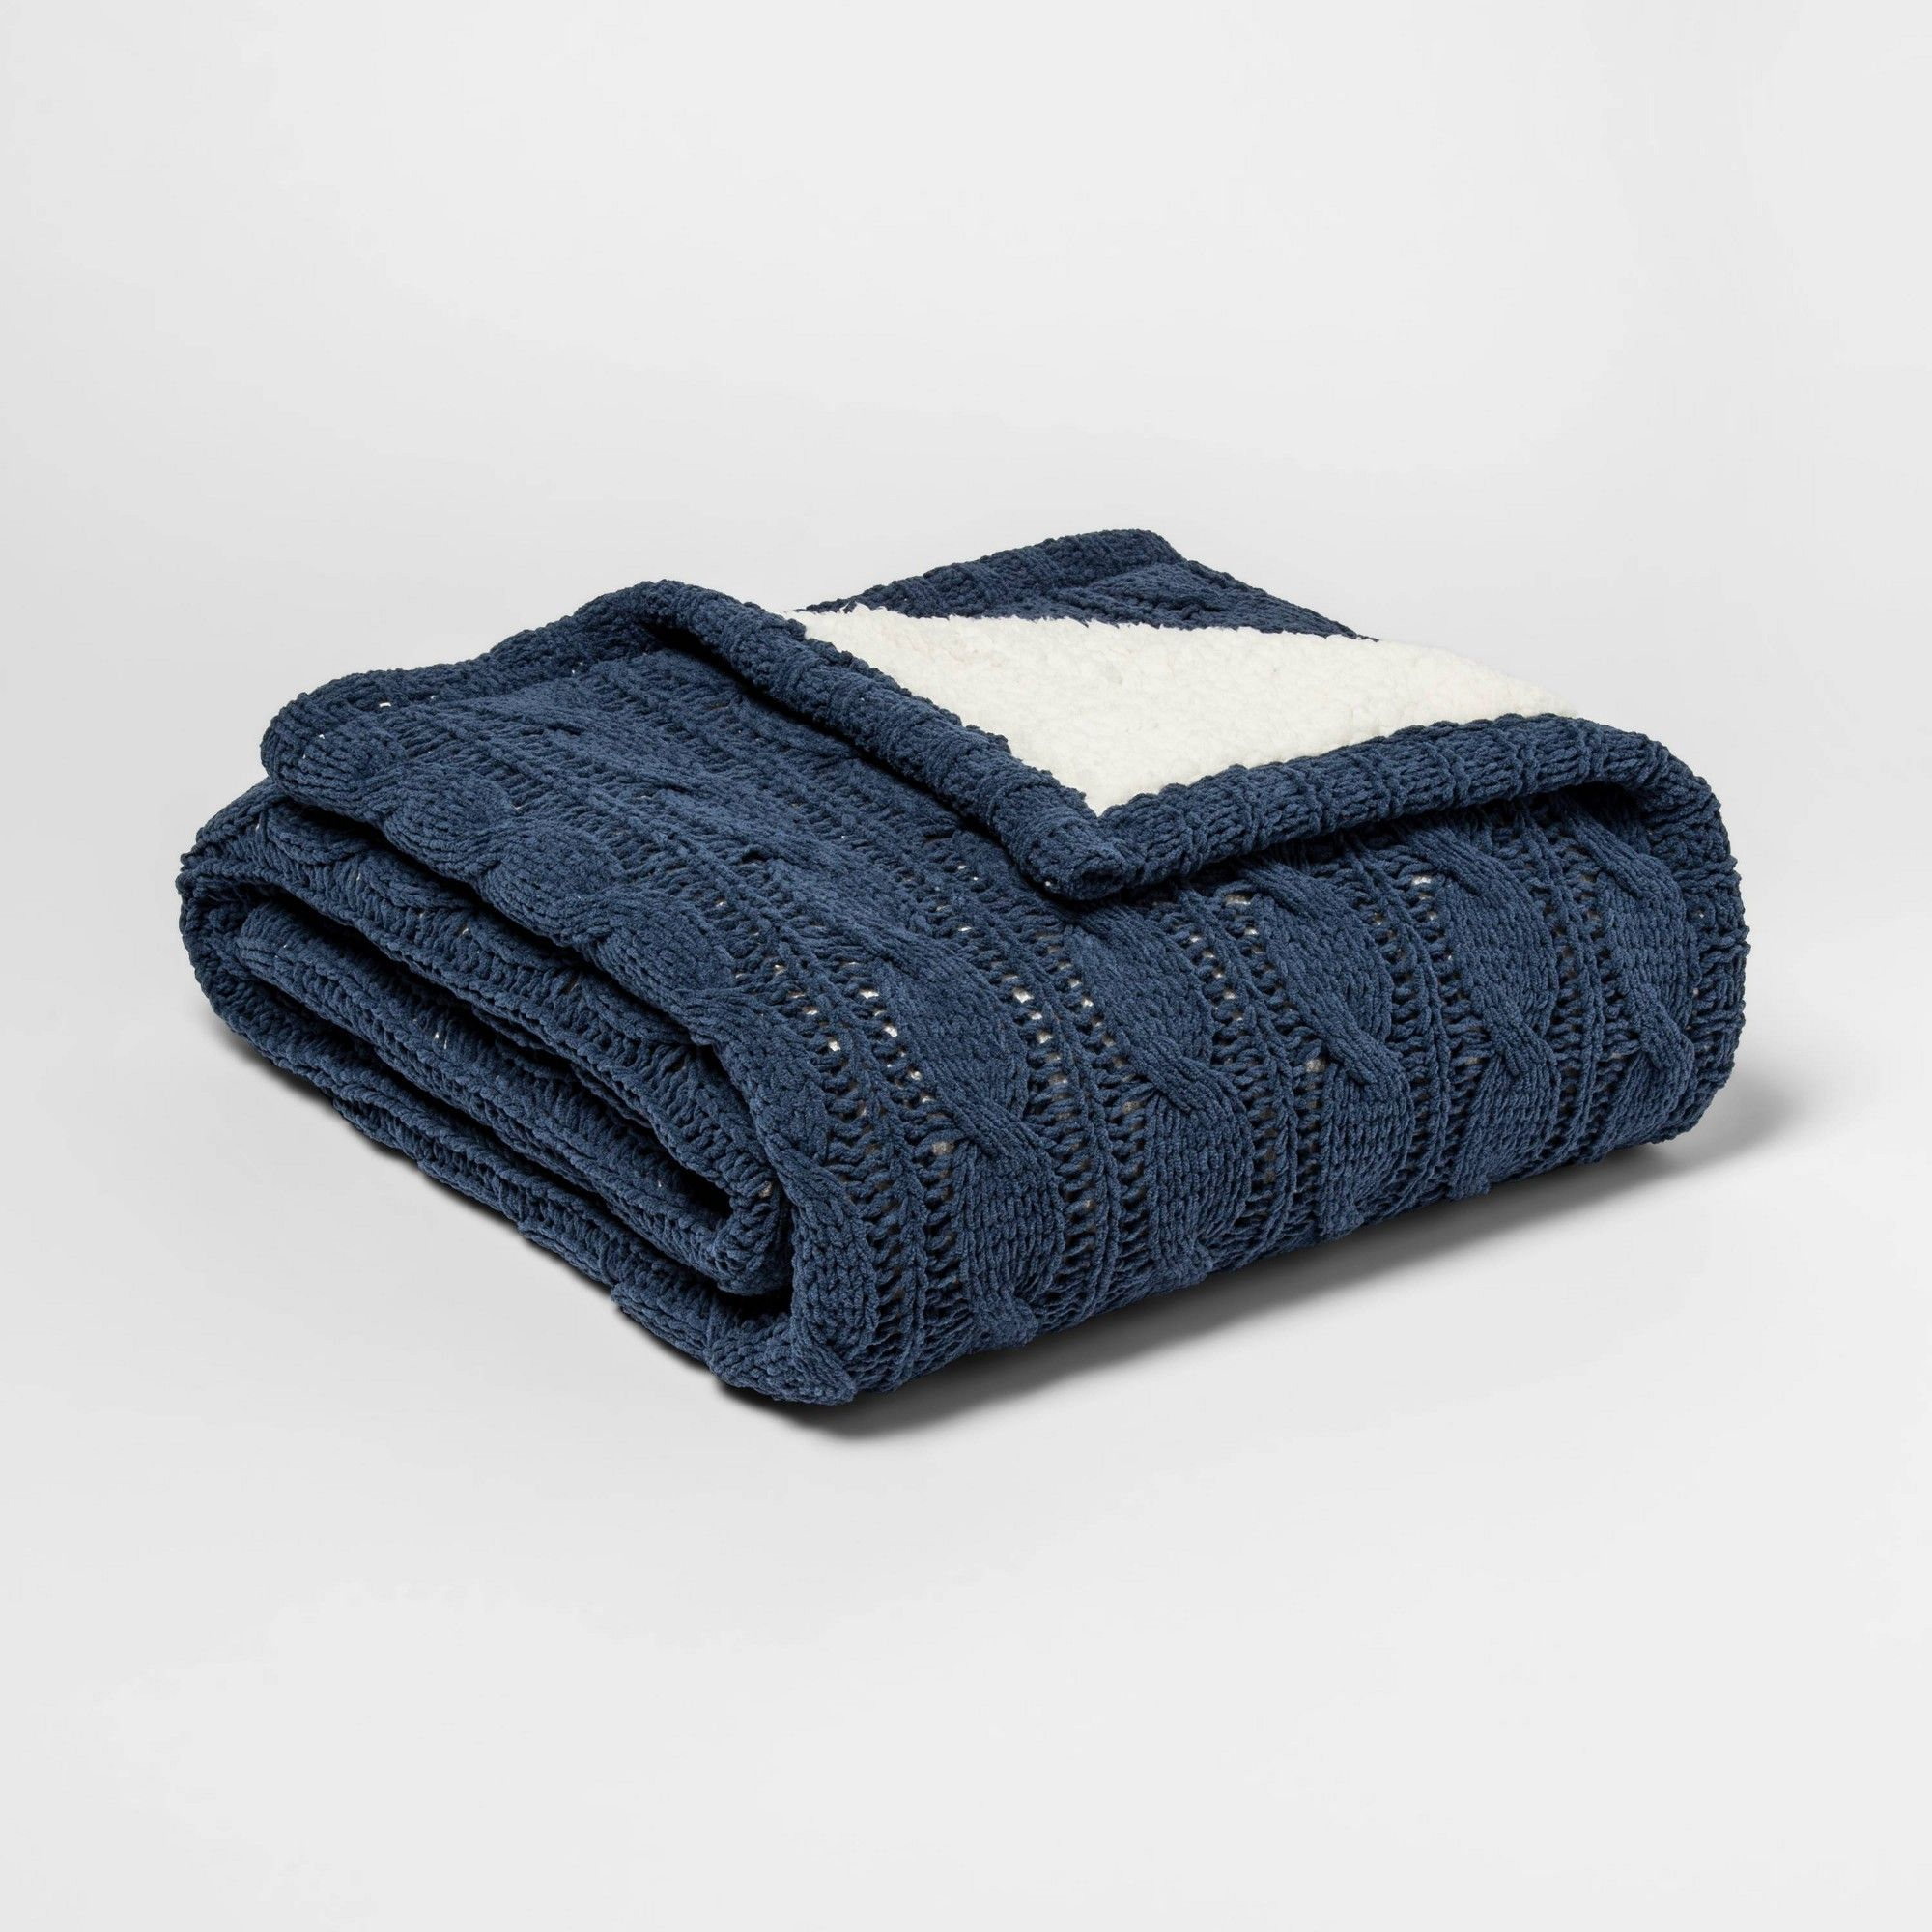 Threshold Cream//Gree 50 x 60 Printed Plush Reverse To Sherpa Throw Blanket